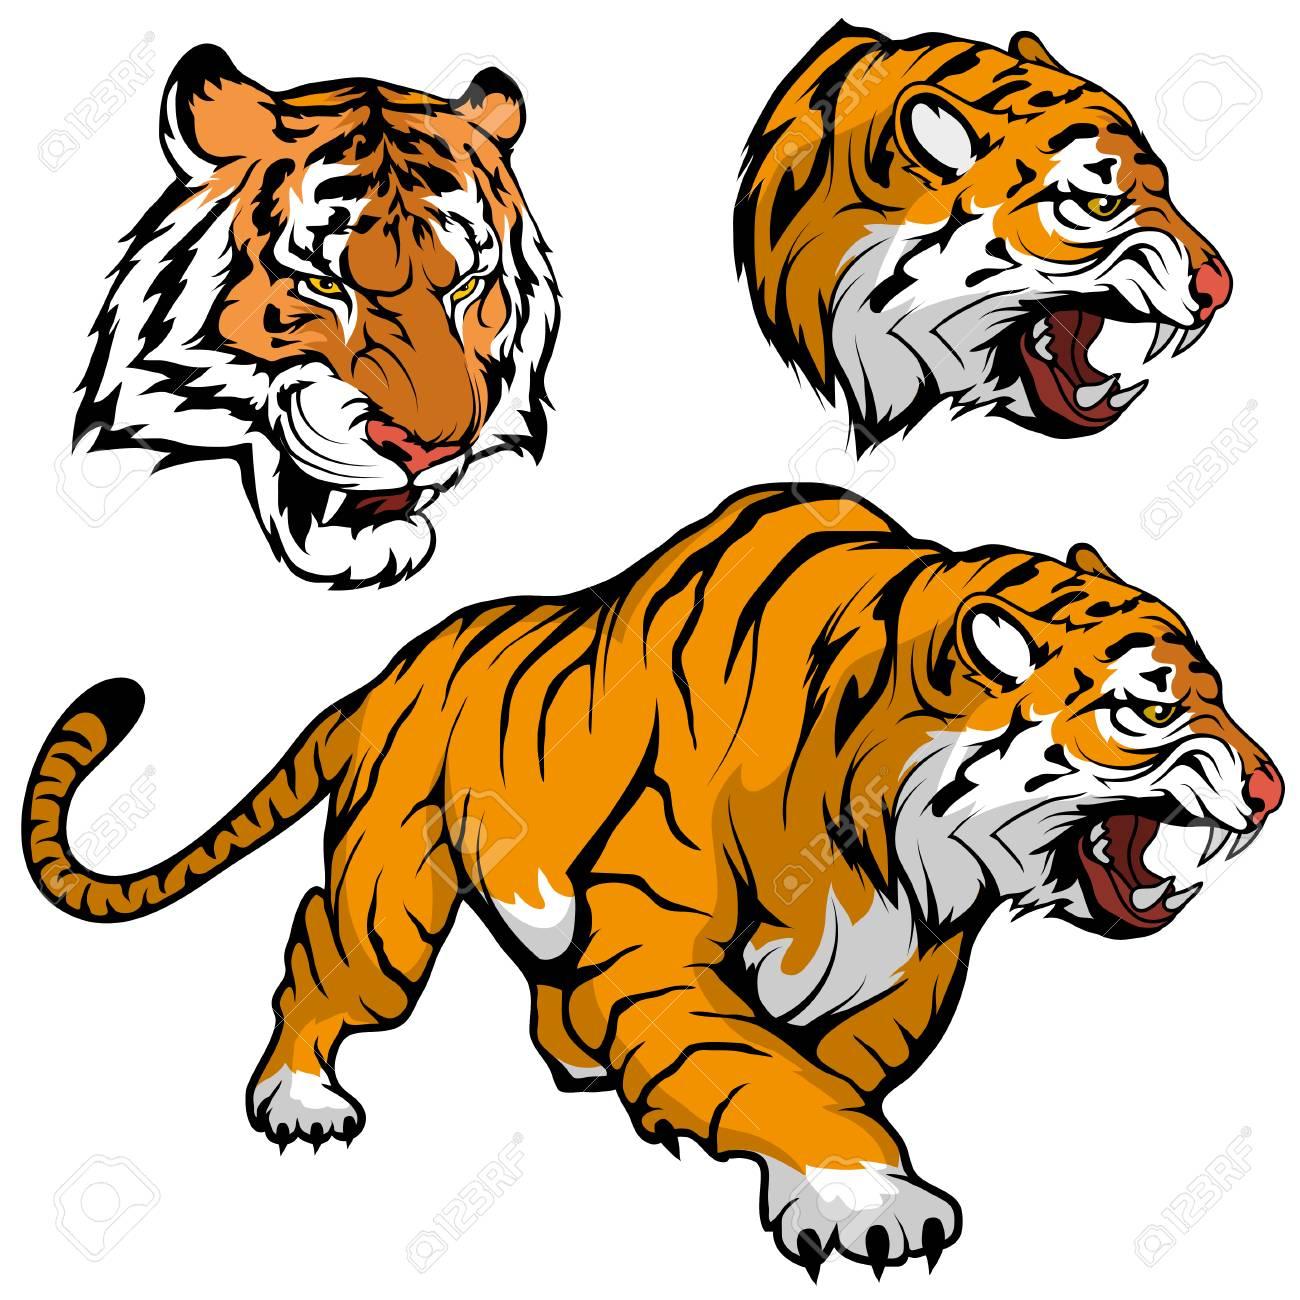 Bengal Tiger Set Suitable As Team Mascot Royal Tiger Drawing Royalty Free Cliparts Vectors And Stock Illustration Image 124802725